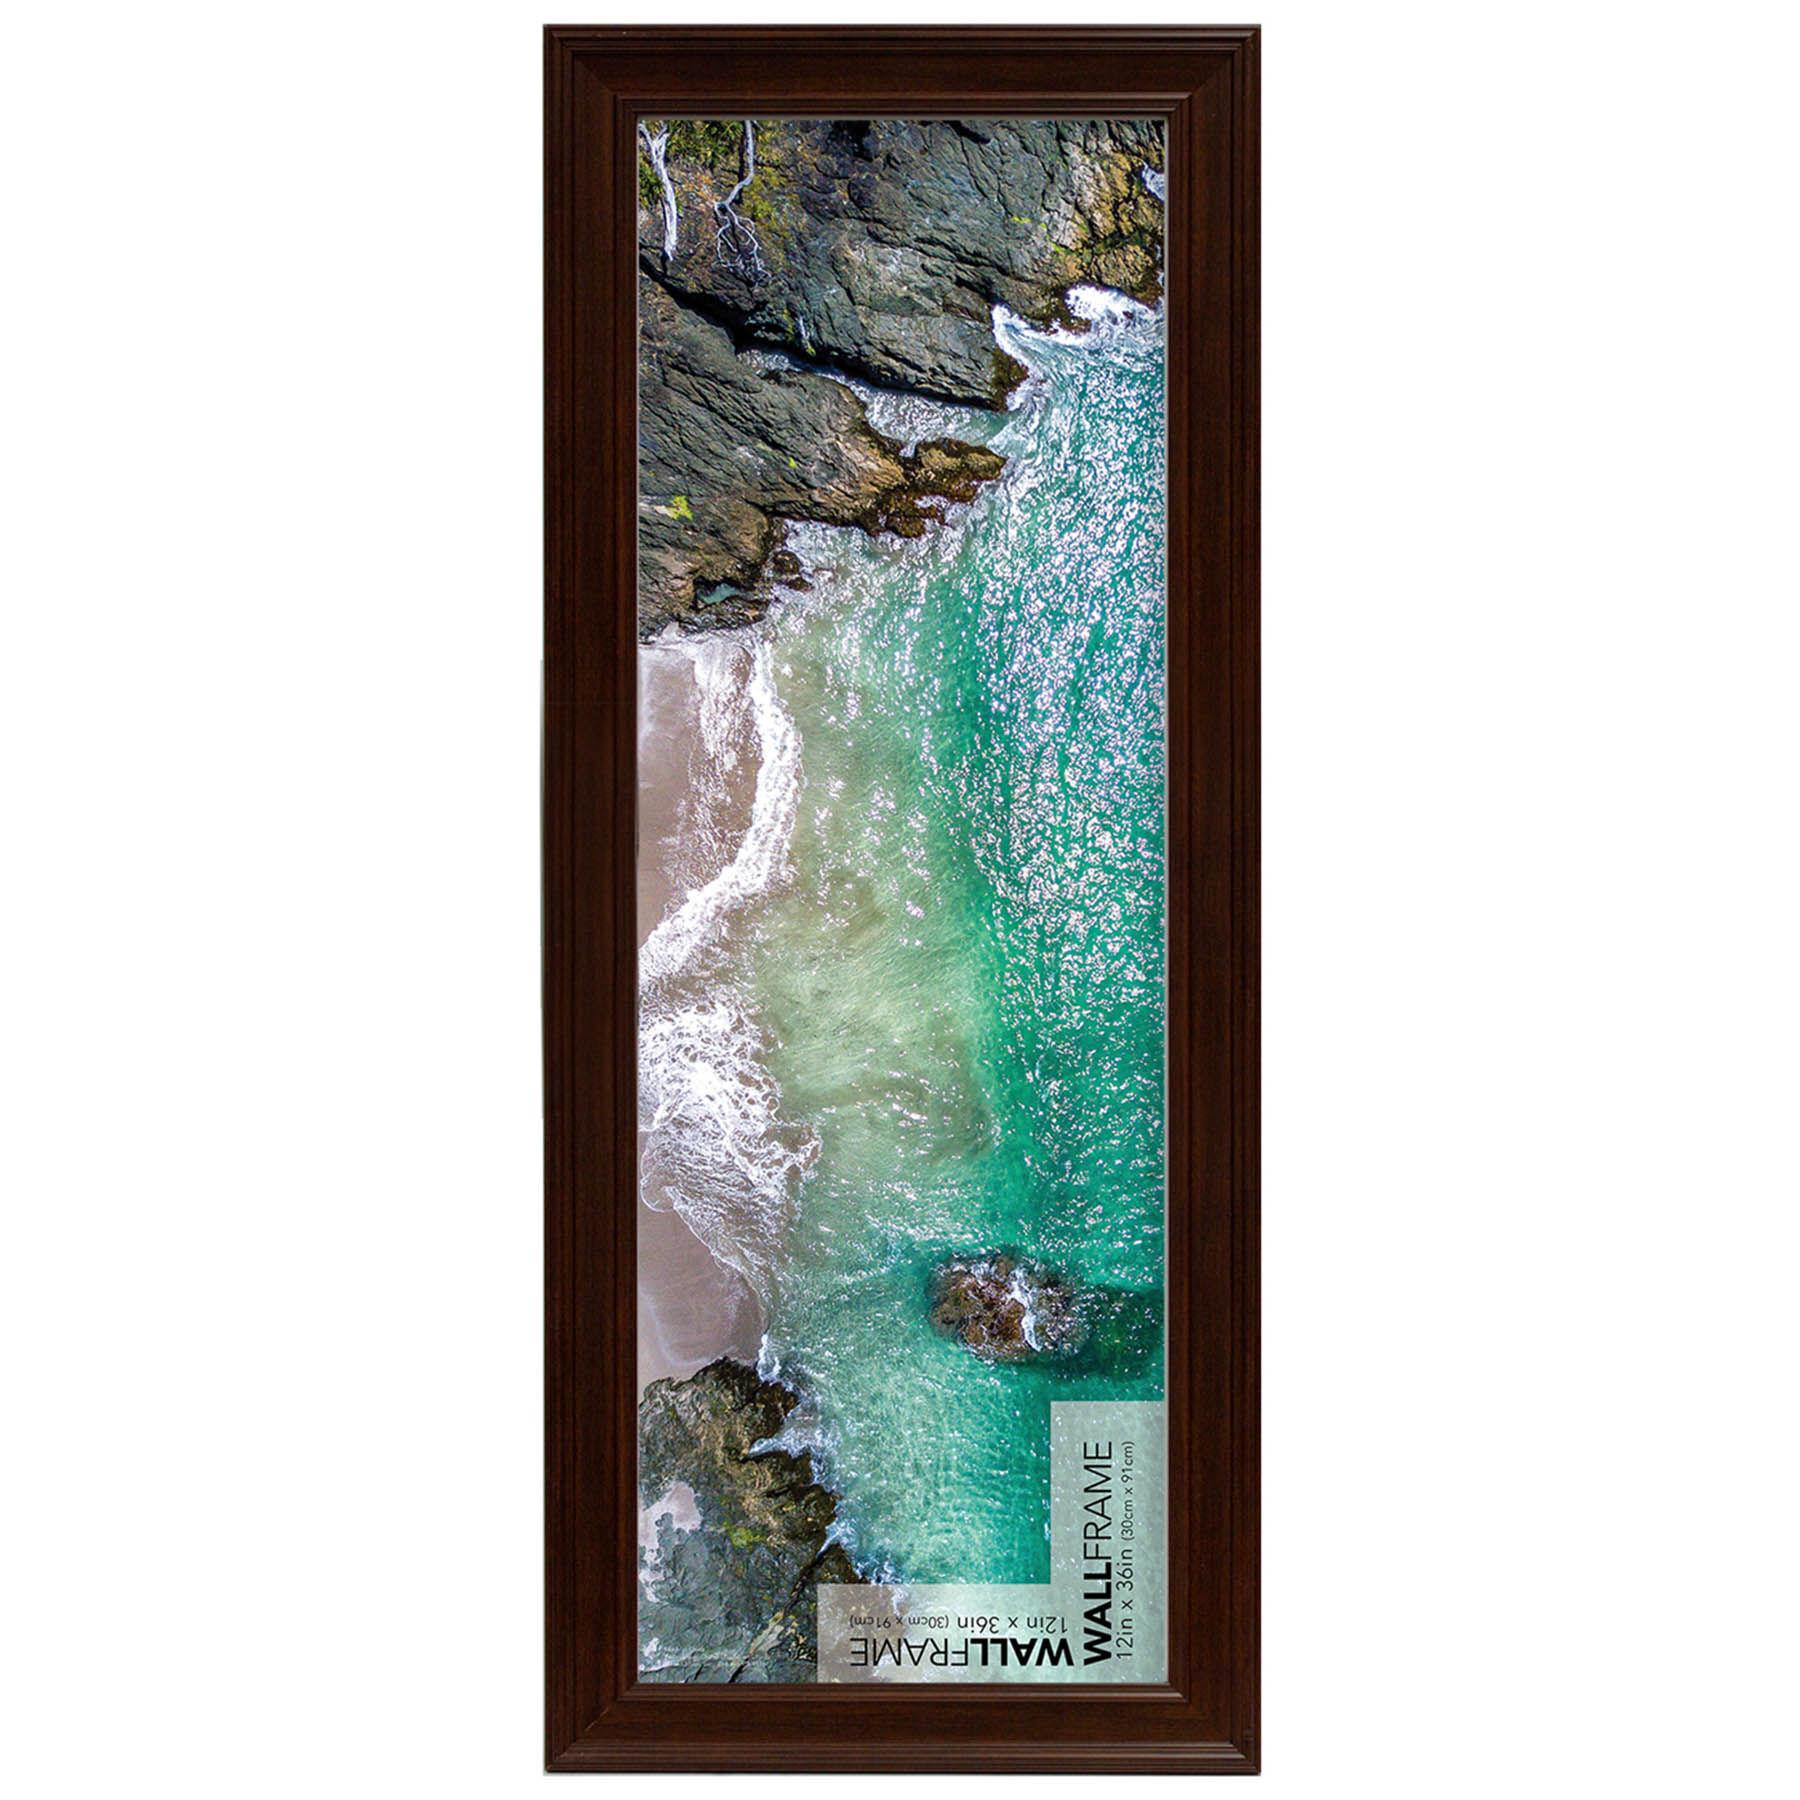 Art Frame 12x36 Home